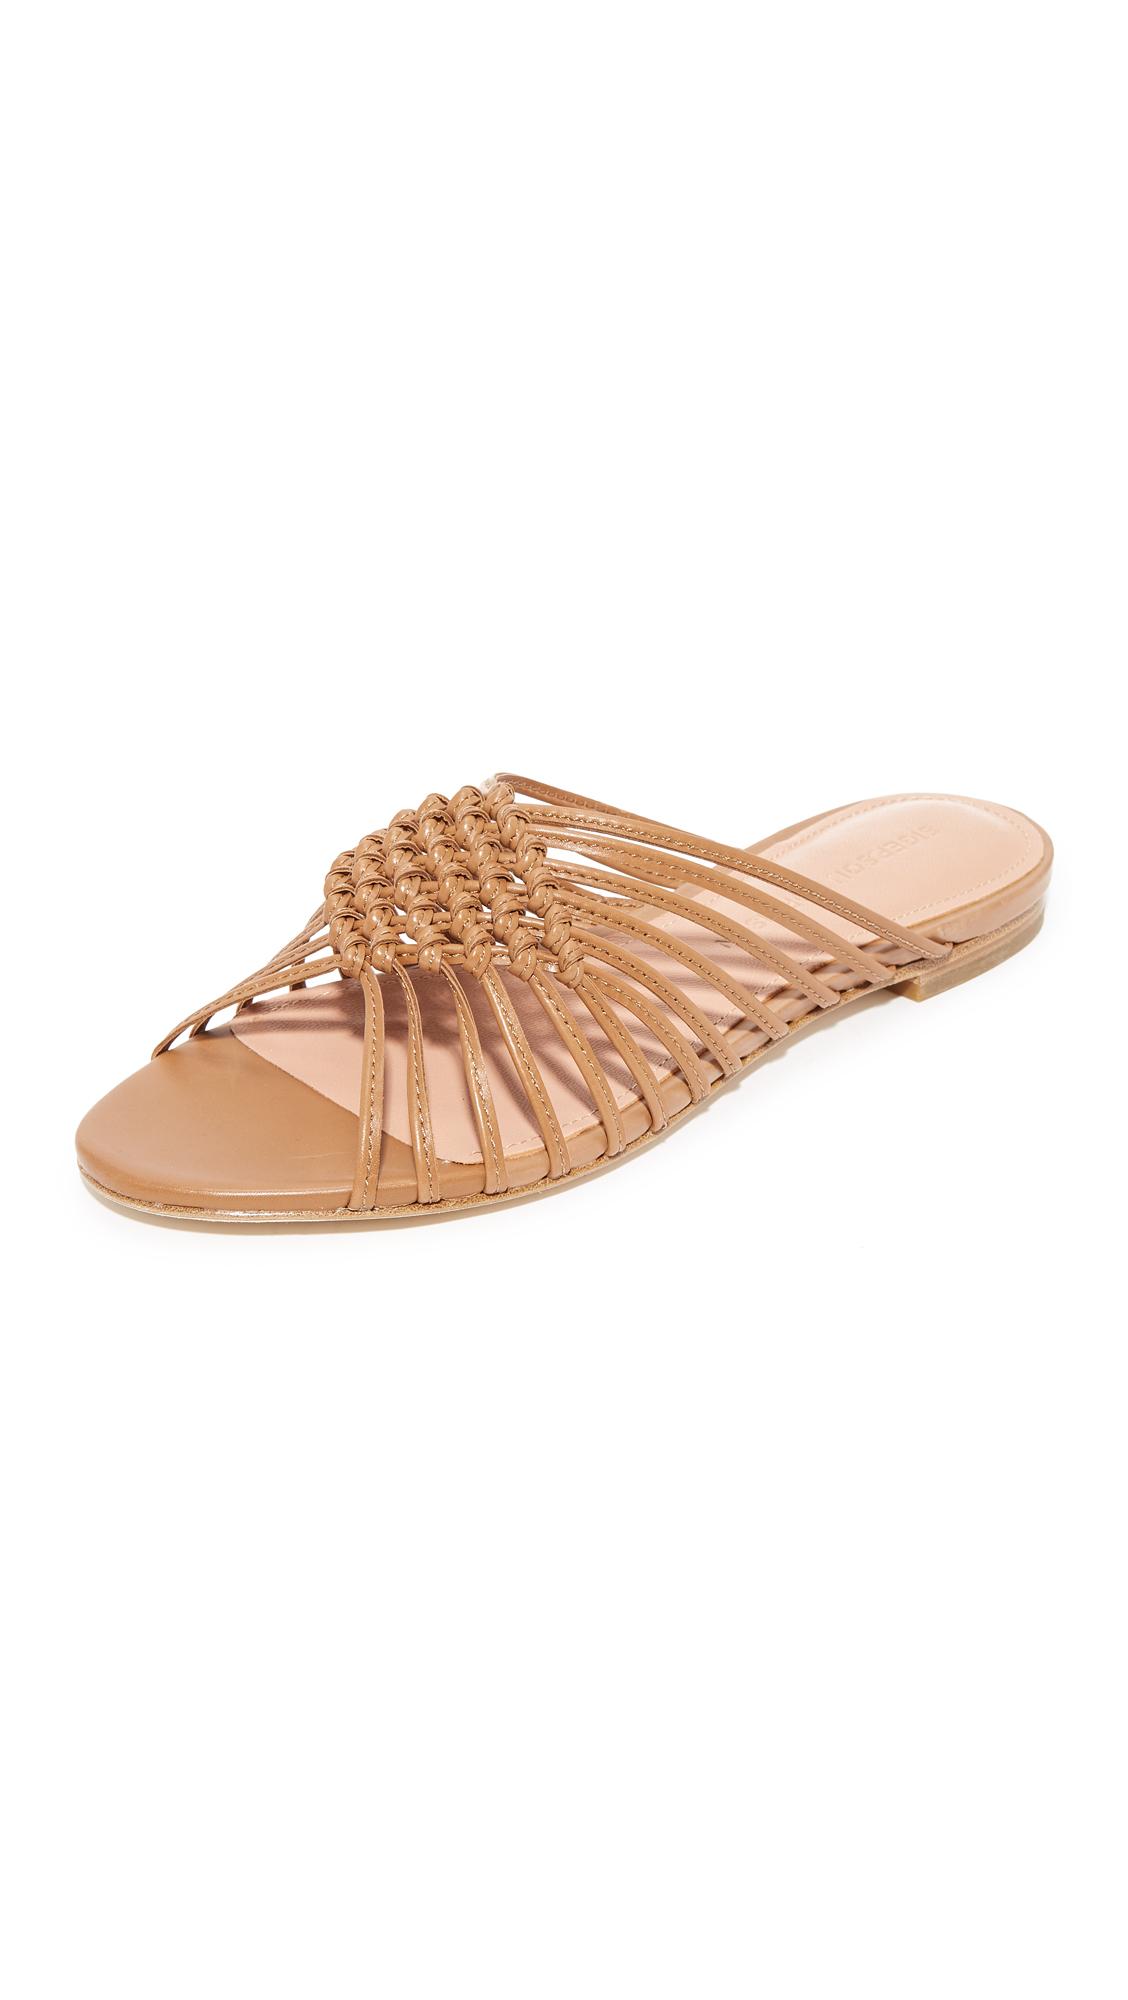 Sigerson Morrison Aggie Woven Slides - Tan